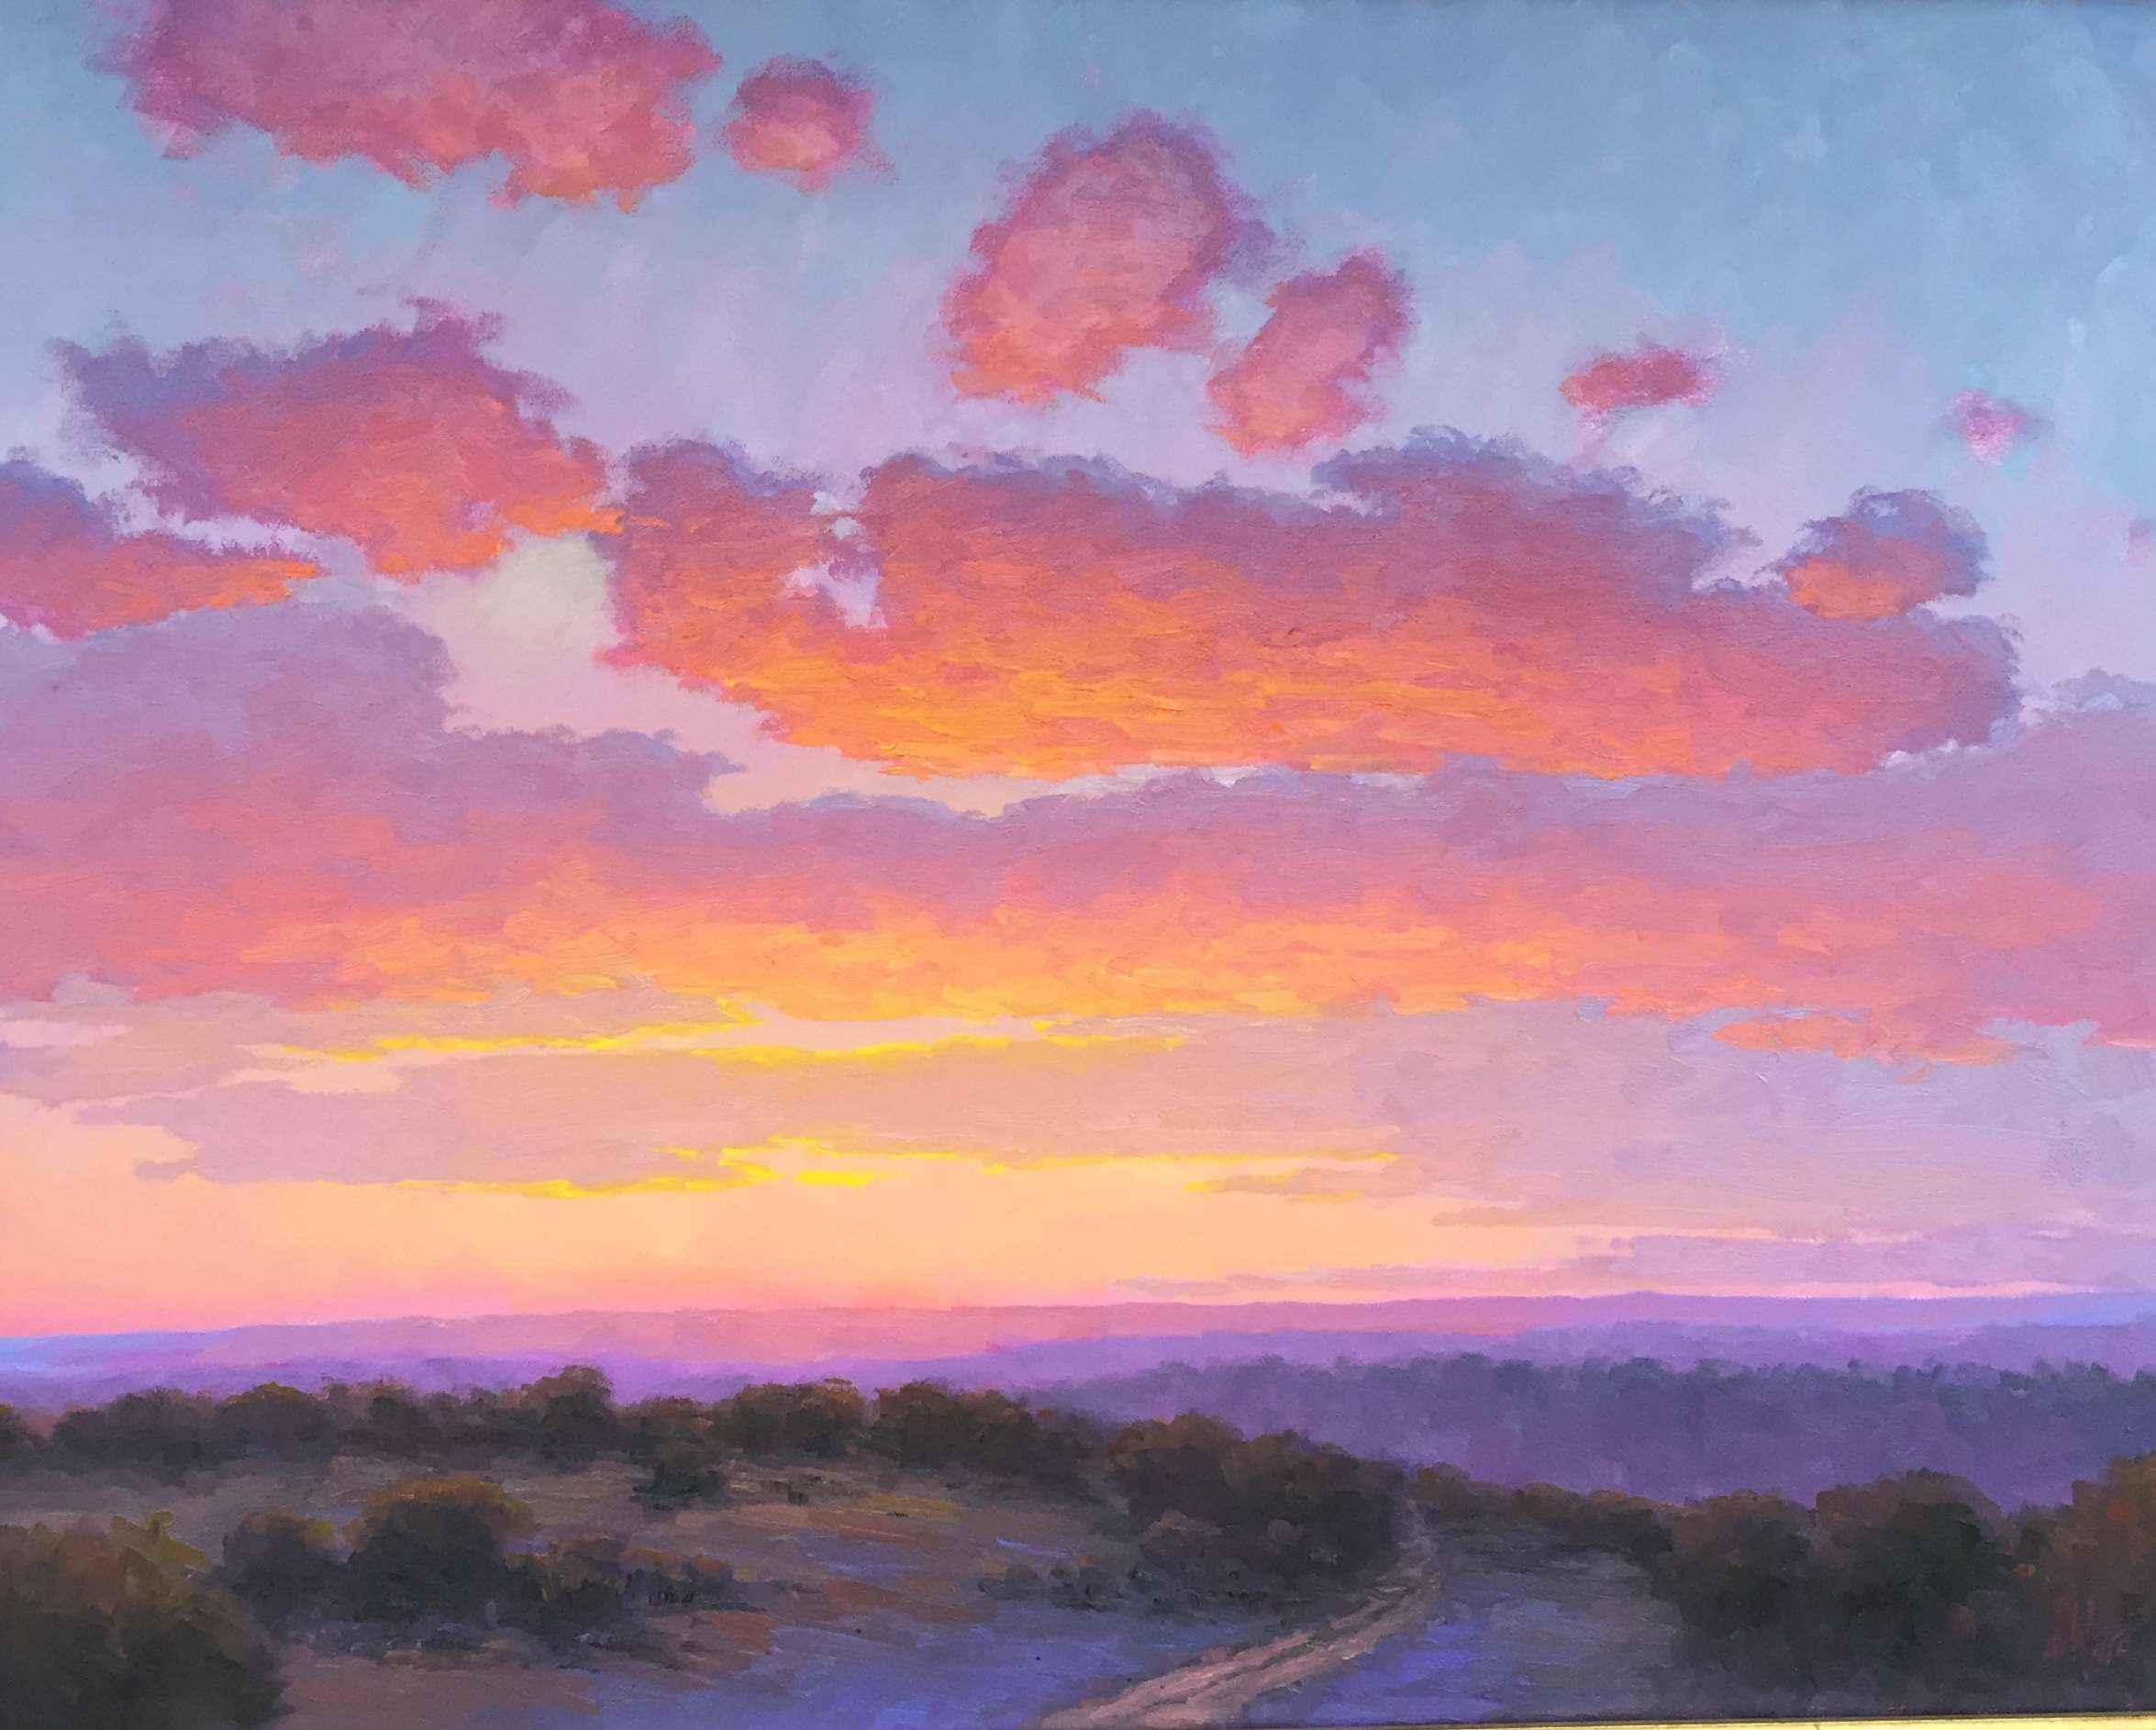 Sundown Over The Hills by  Don Ward - Masterpiece Online